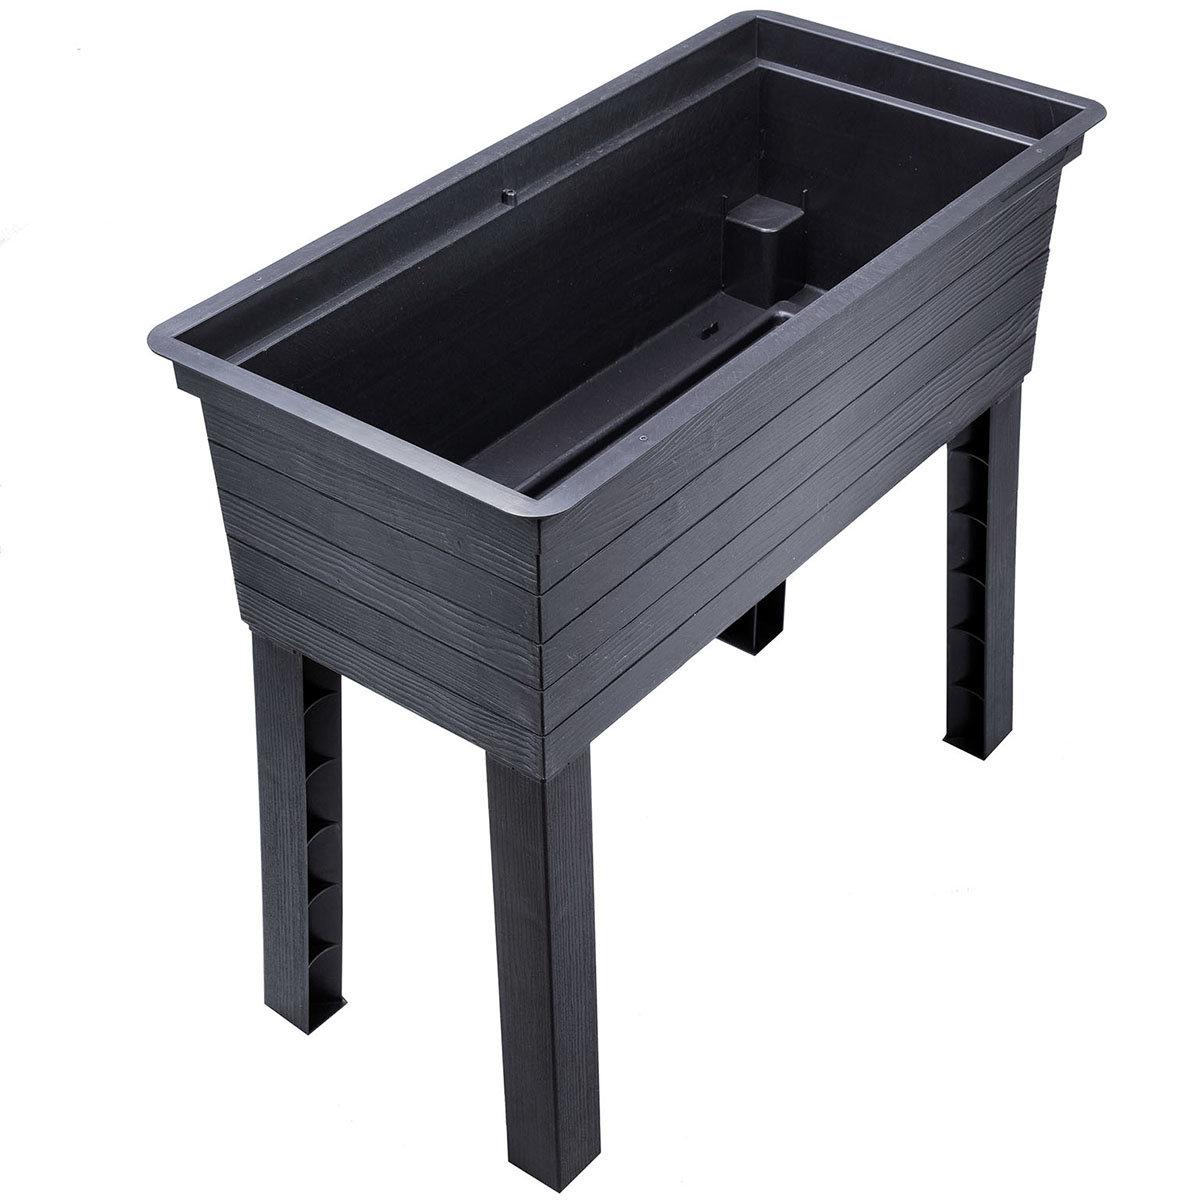 GARANTIA URBAN Balkon-Hochbeet inkl. Anzuchthaube, Kunststoff, schwarz/transparent, 75x37x87 cm | #10